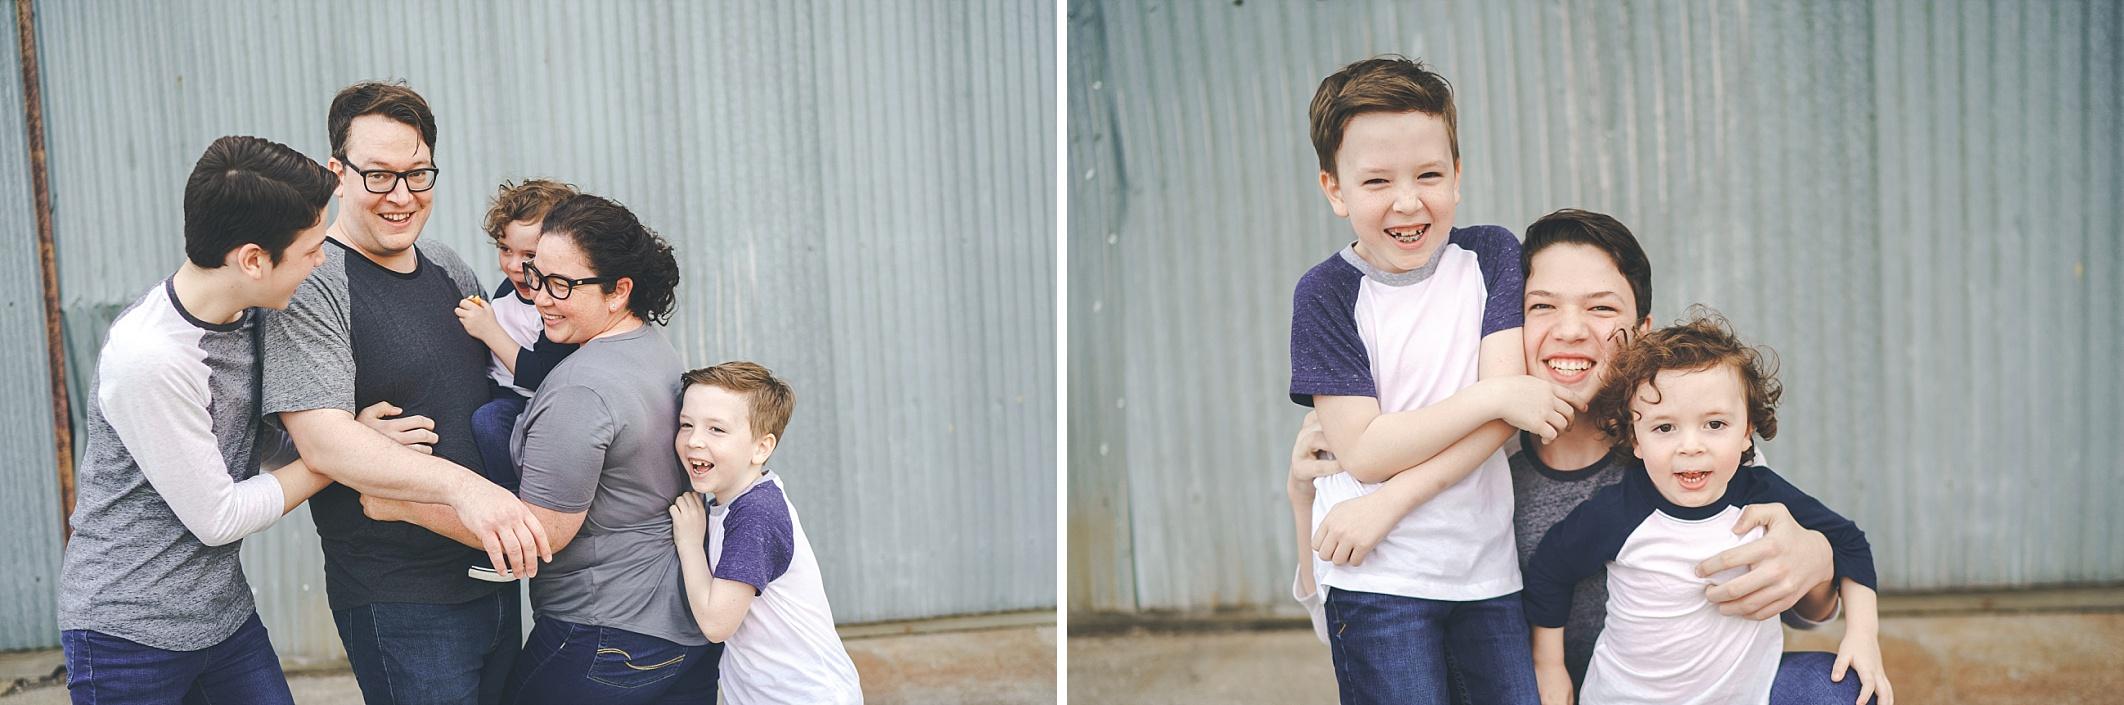 0018_young-family-children-photography-dayton.jpg